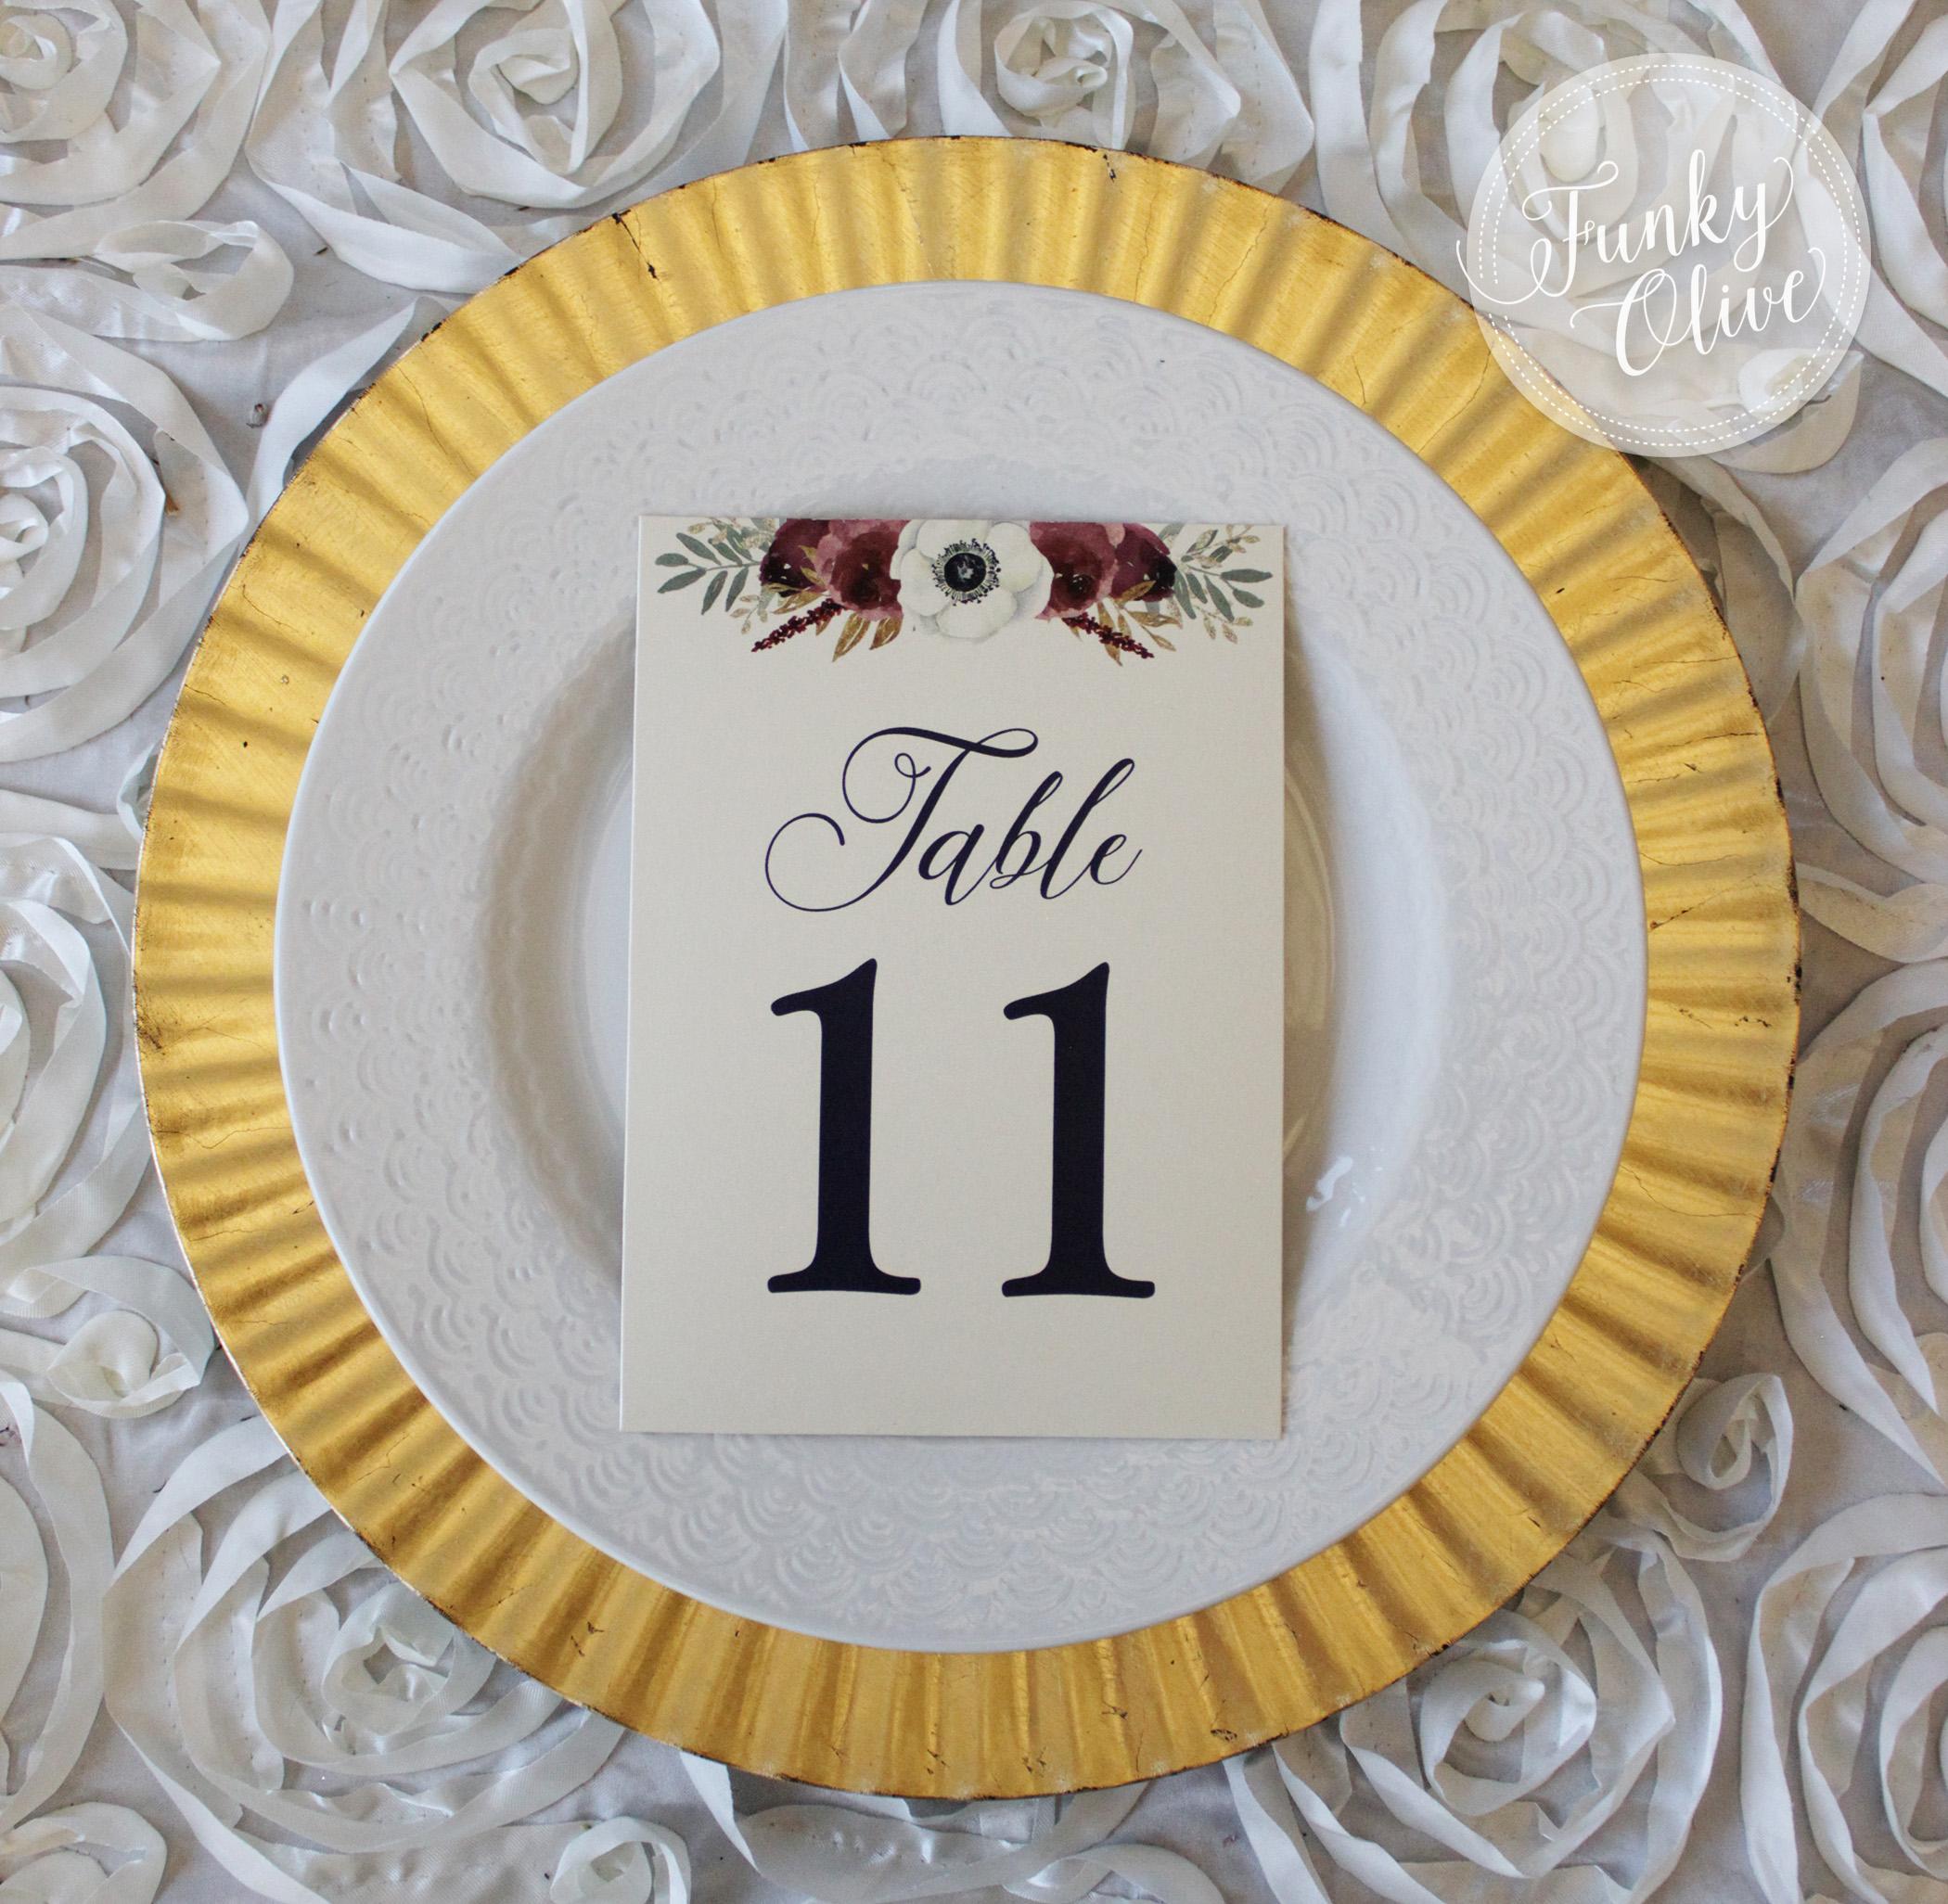 BURGUNDY FLORAL TABLE NUMBER 1.jpg